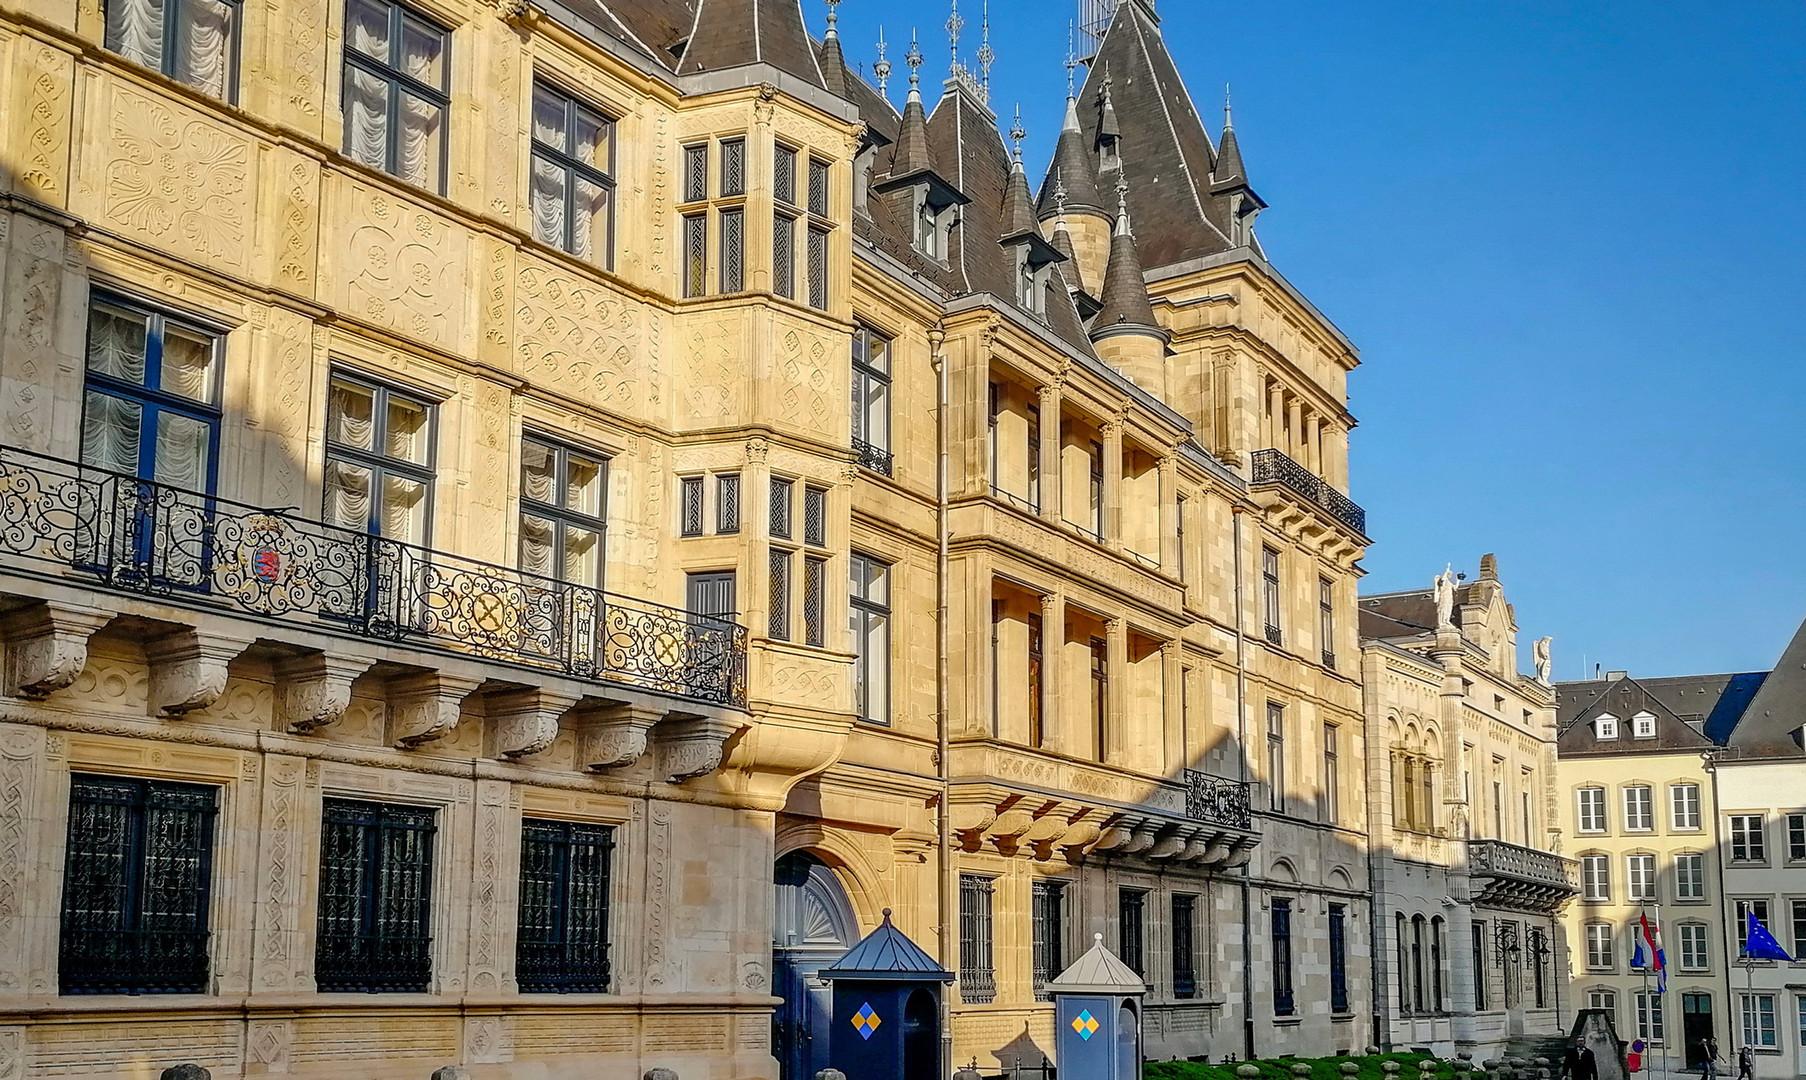 Дворец великих герцогов, Люксембург